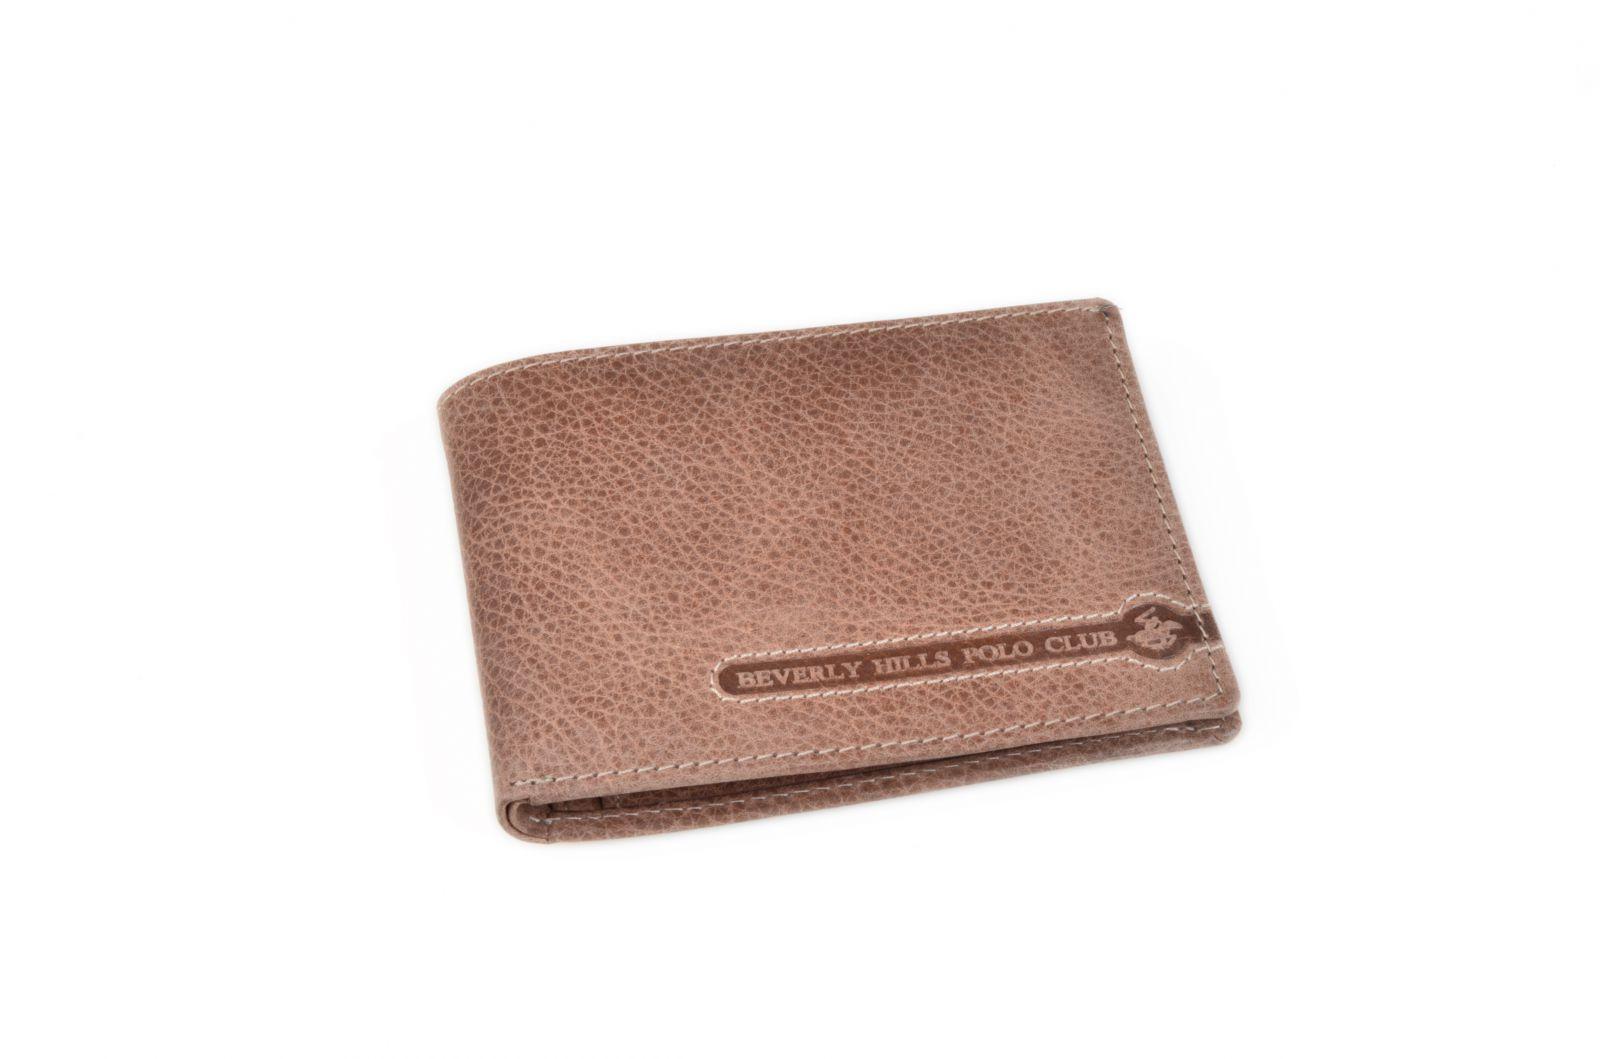 Peněženka pánská BHPC Tucson BH-391-25 hnědá v krabičce